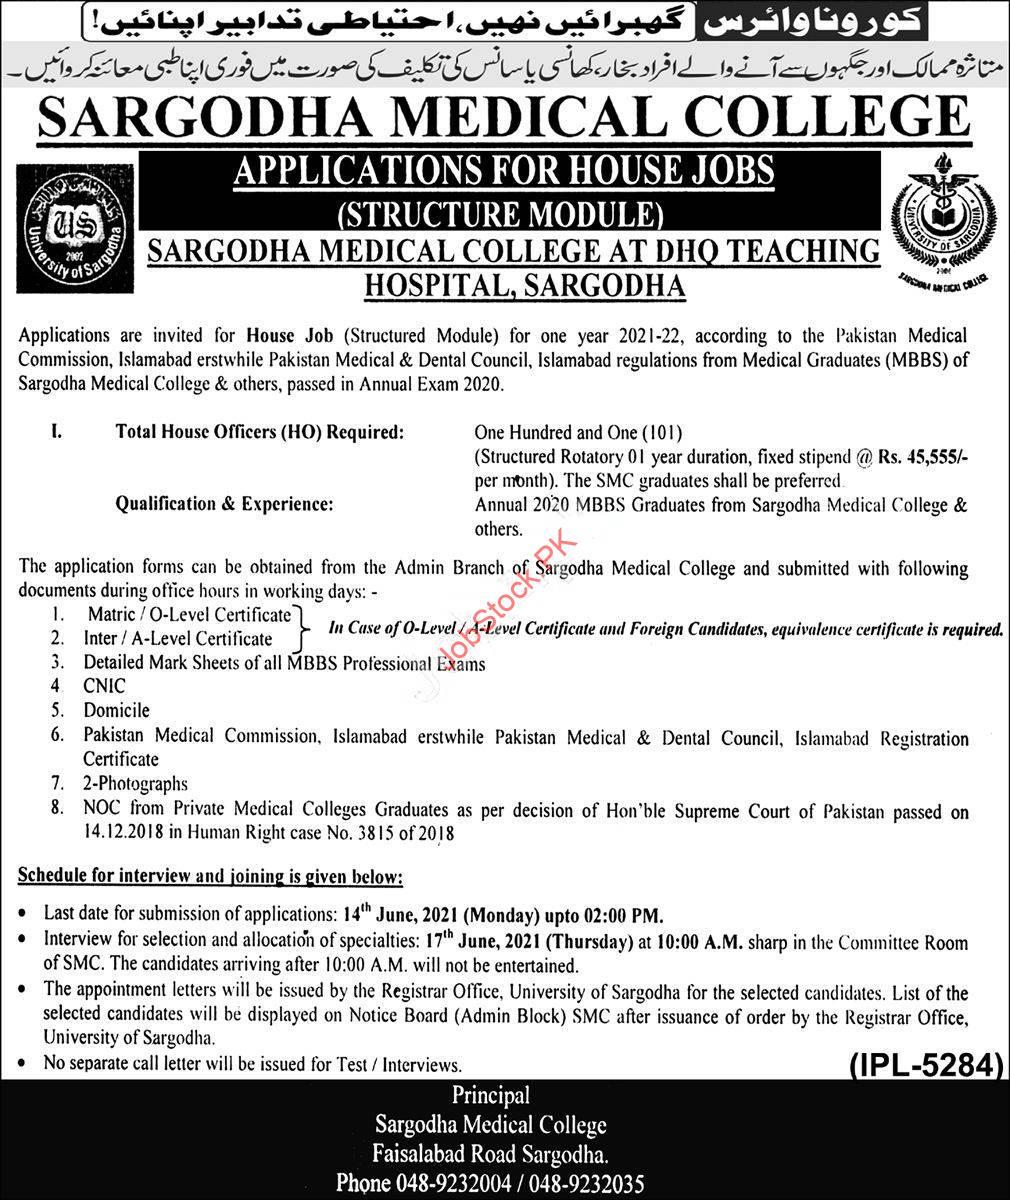 Sargodha Medical College House Jobs Dhq Teaching Hospital Sargodha